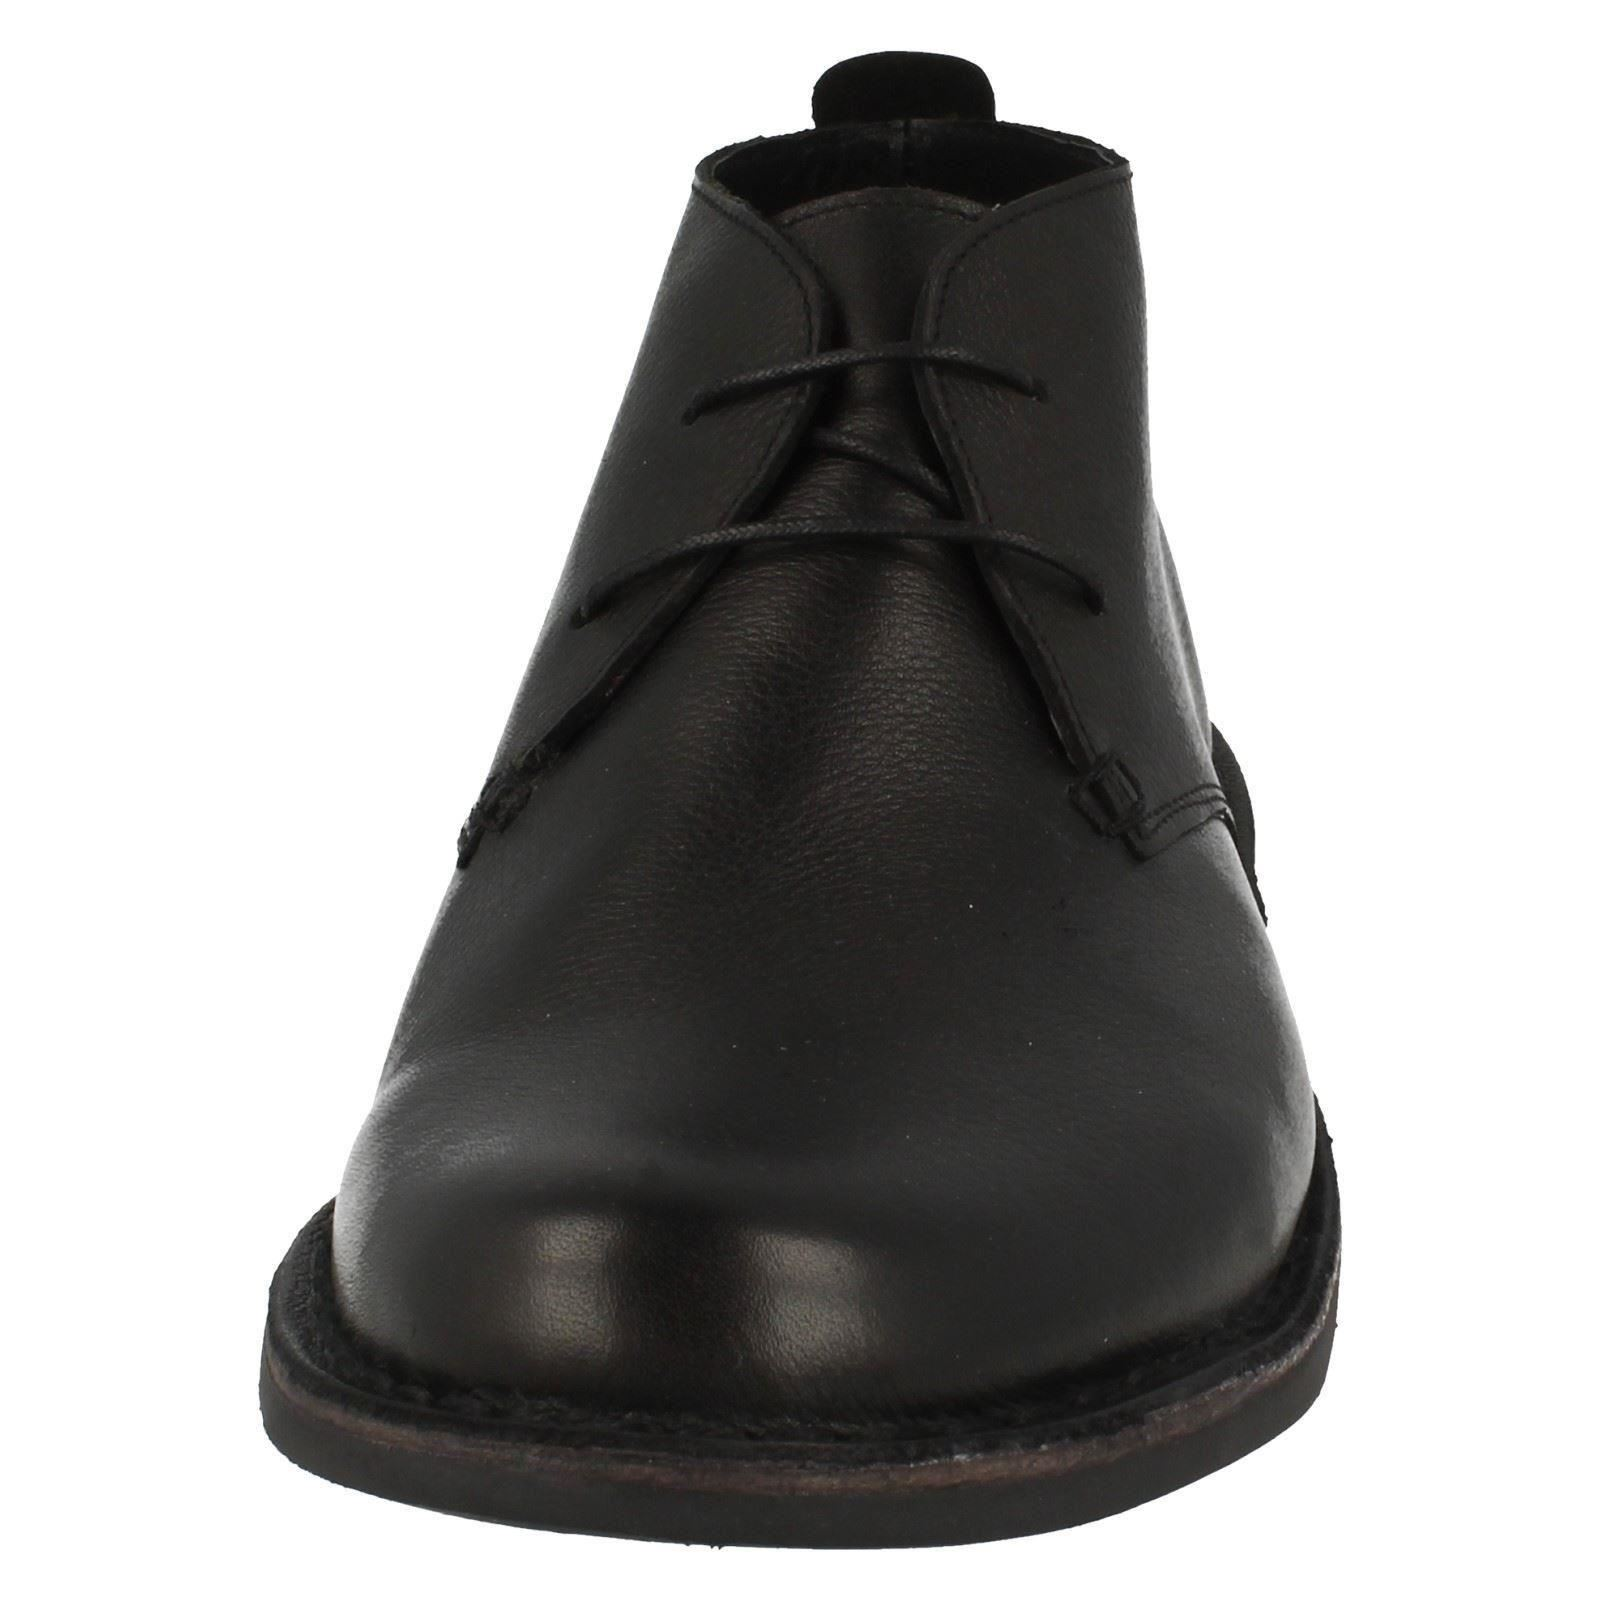 Uomo Padders 'Judd' Ankle Stiefel 'Judd' Padders e3c733